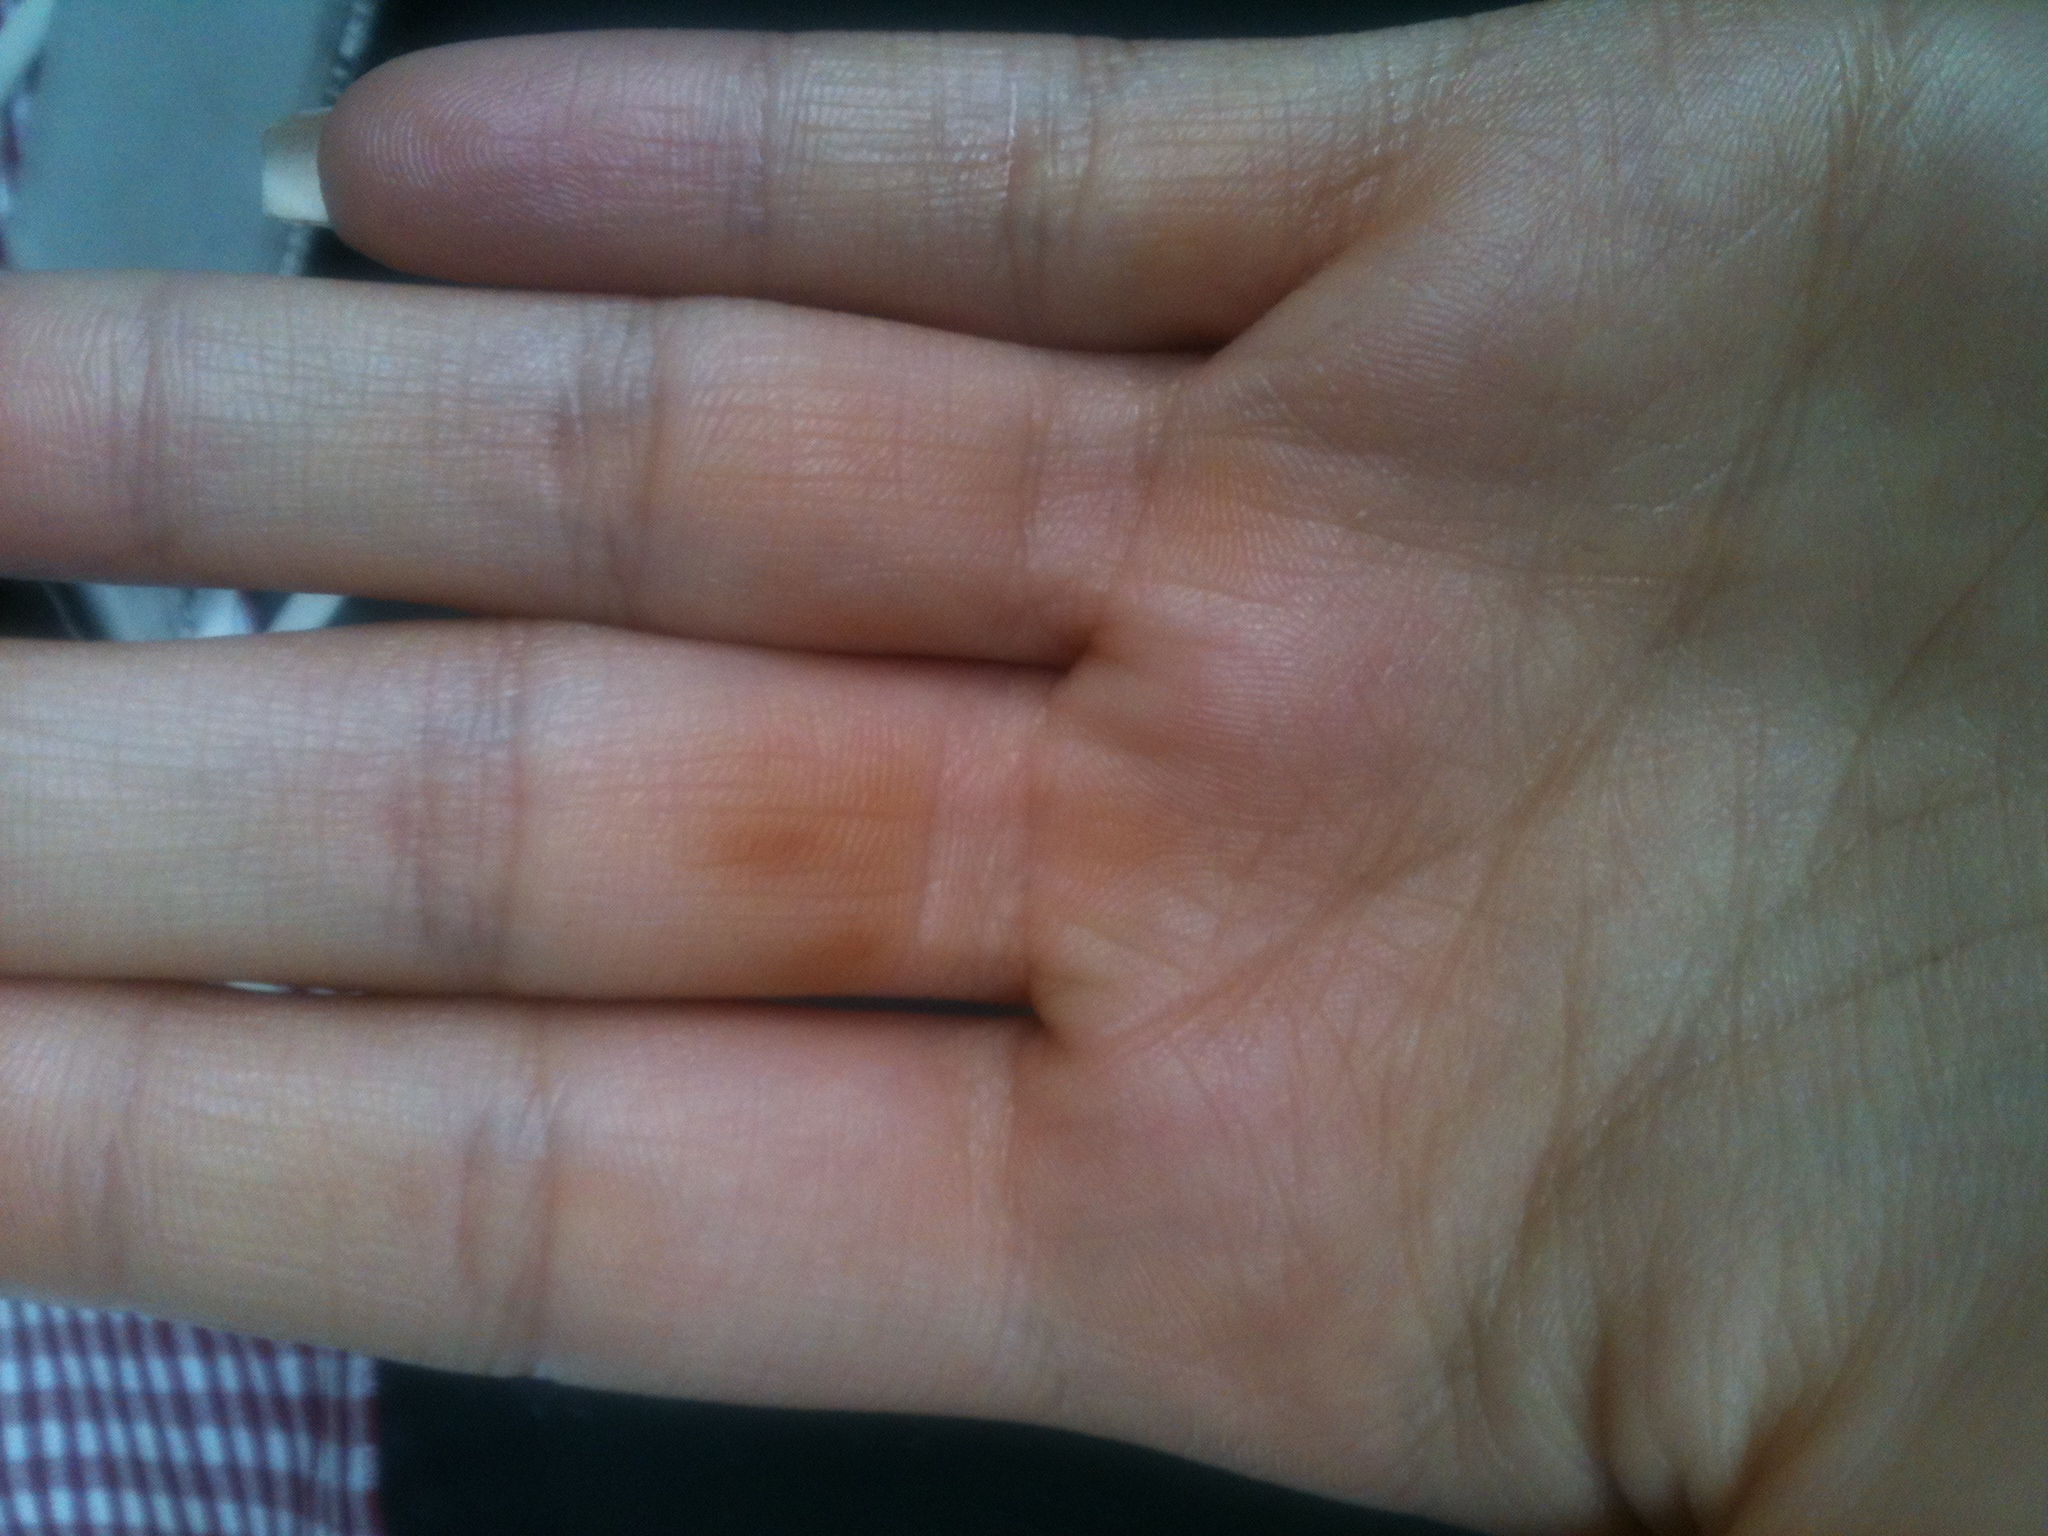 Braune flecken am finger